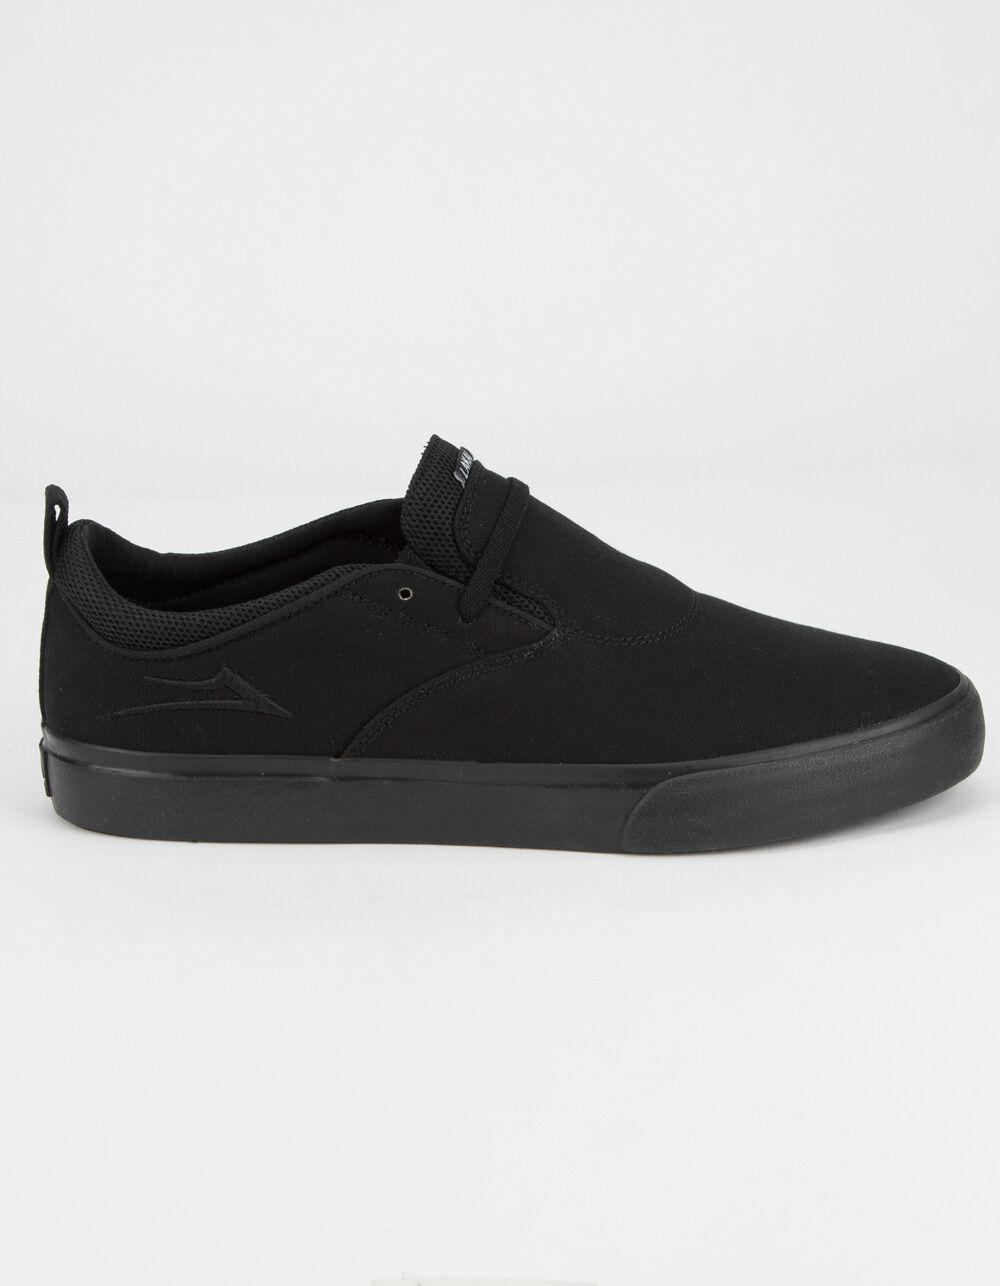 LAKAI Riley Hawk 2 Black Canvas Shoes